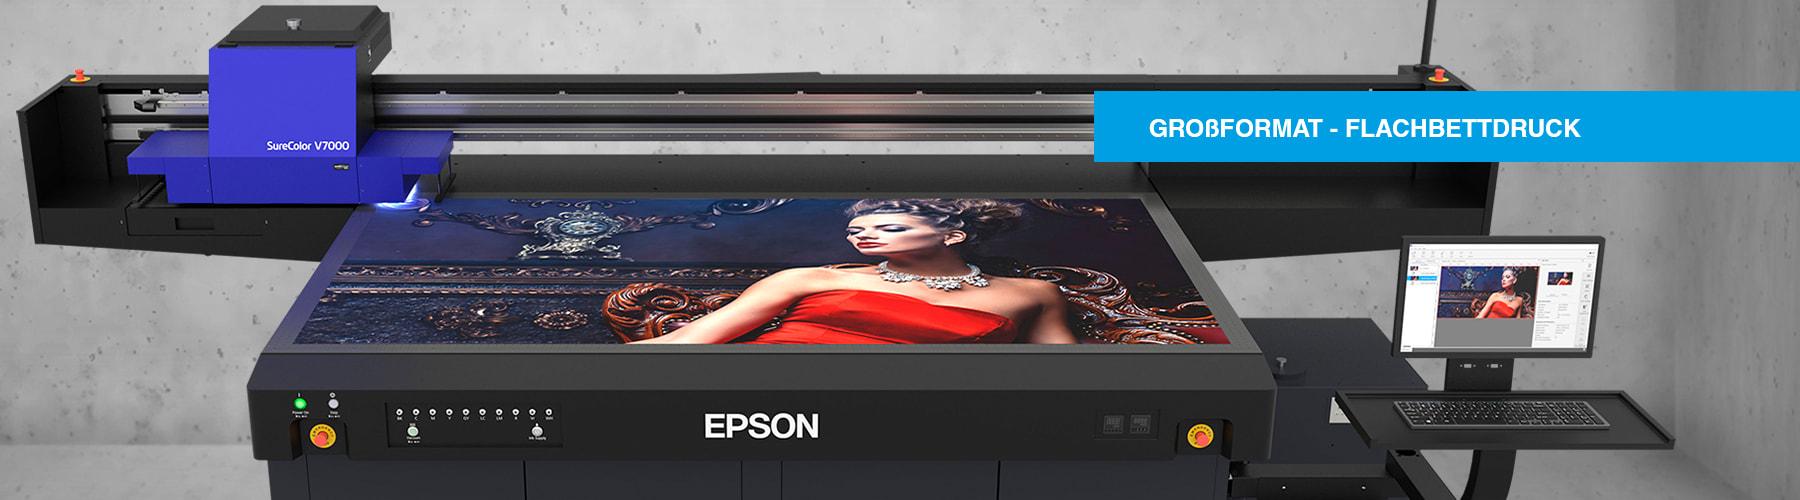 Epson SureColor SC-V7000 />